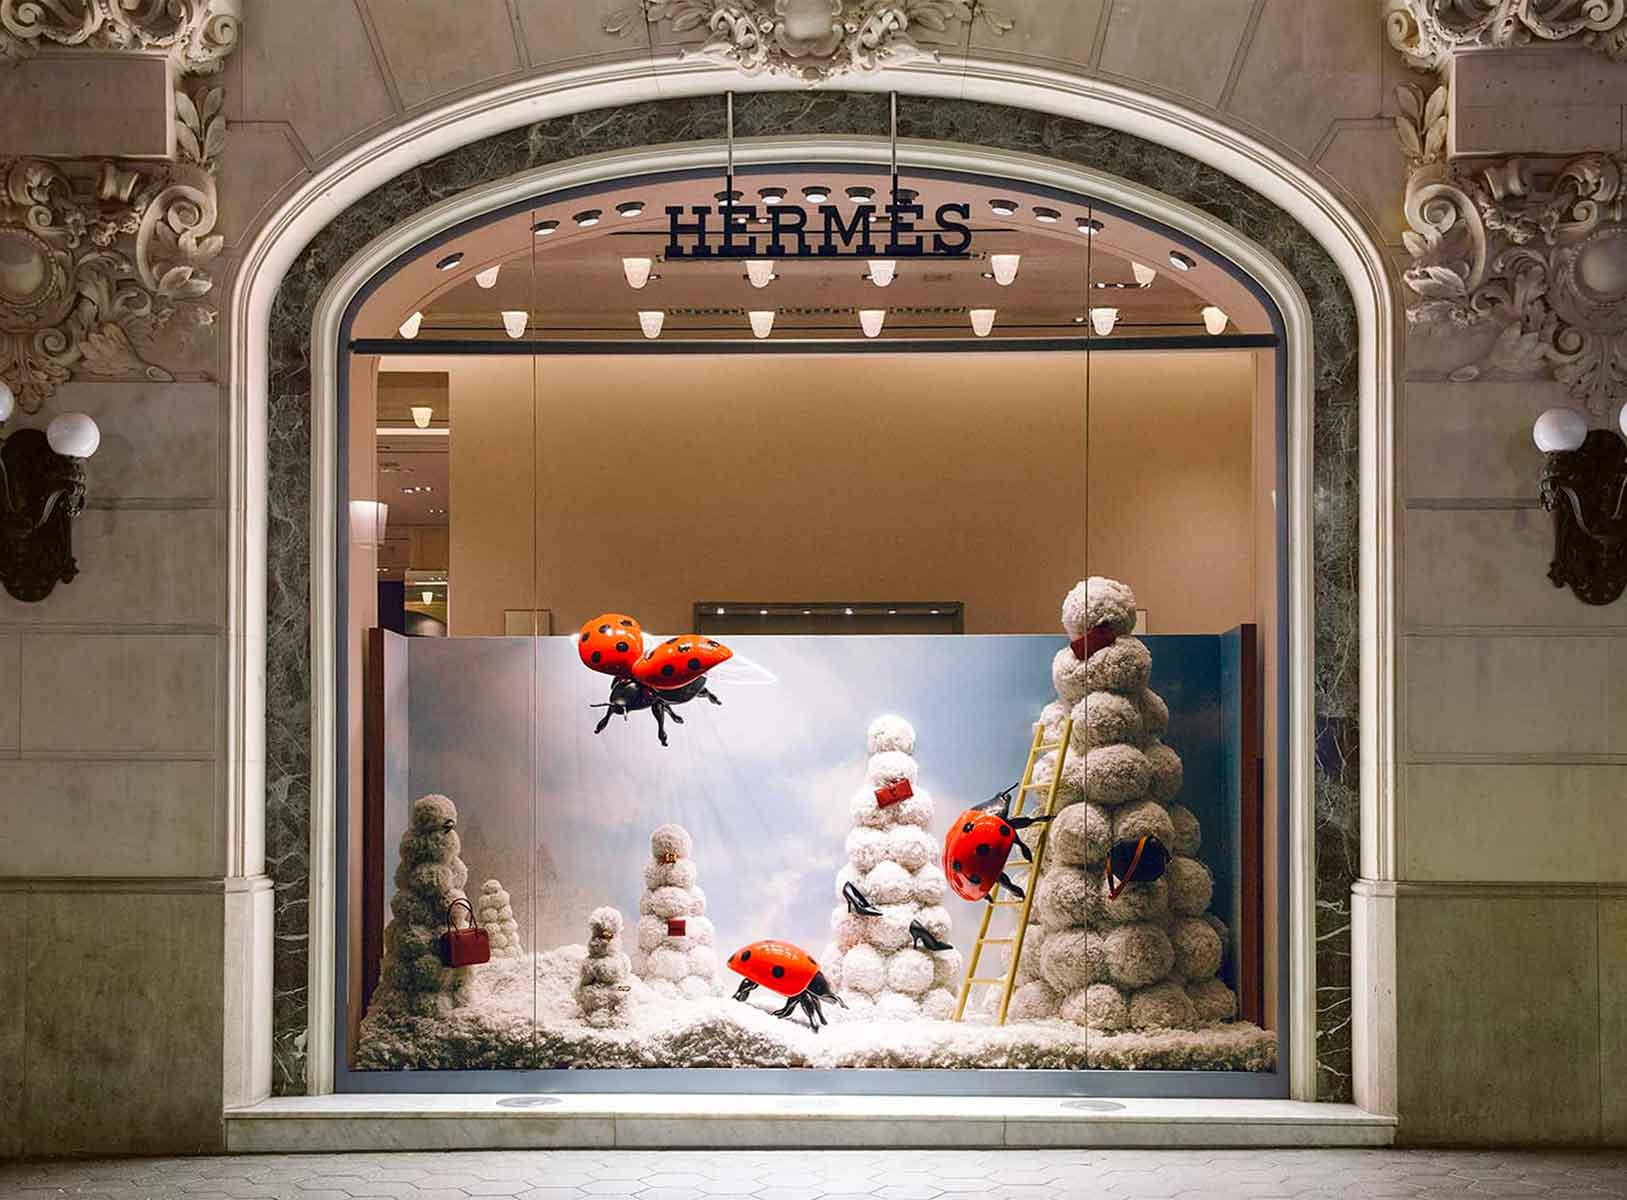 Escaparates de Navidad Hermès España, decoración con árboles de porexpan